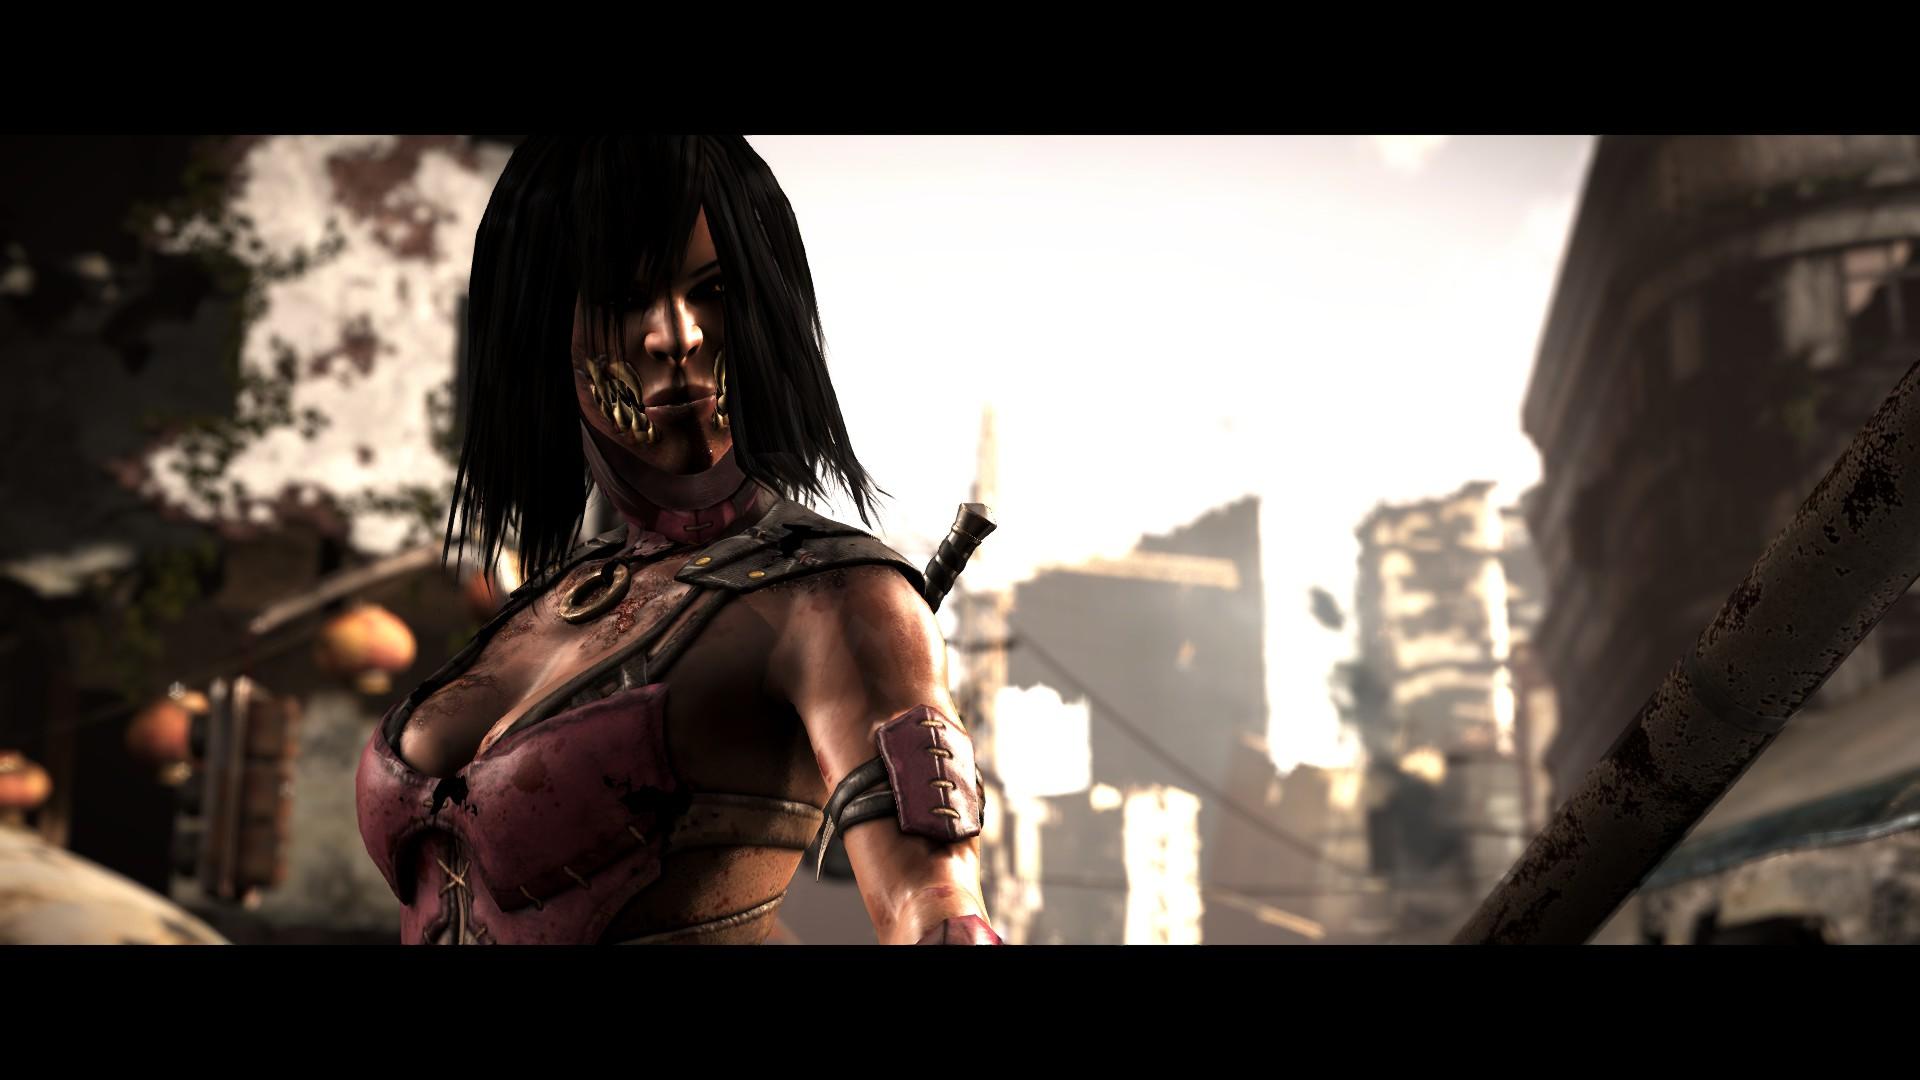 20170120150123_1.jpg - Mortal Kombat X